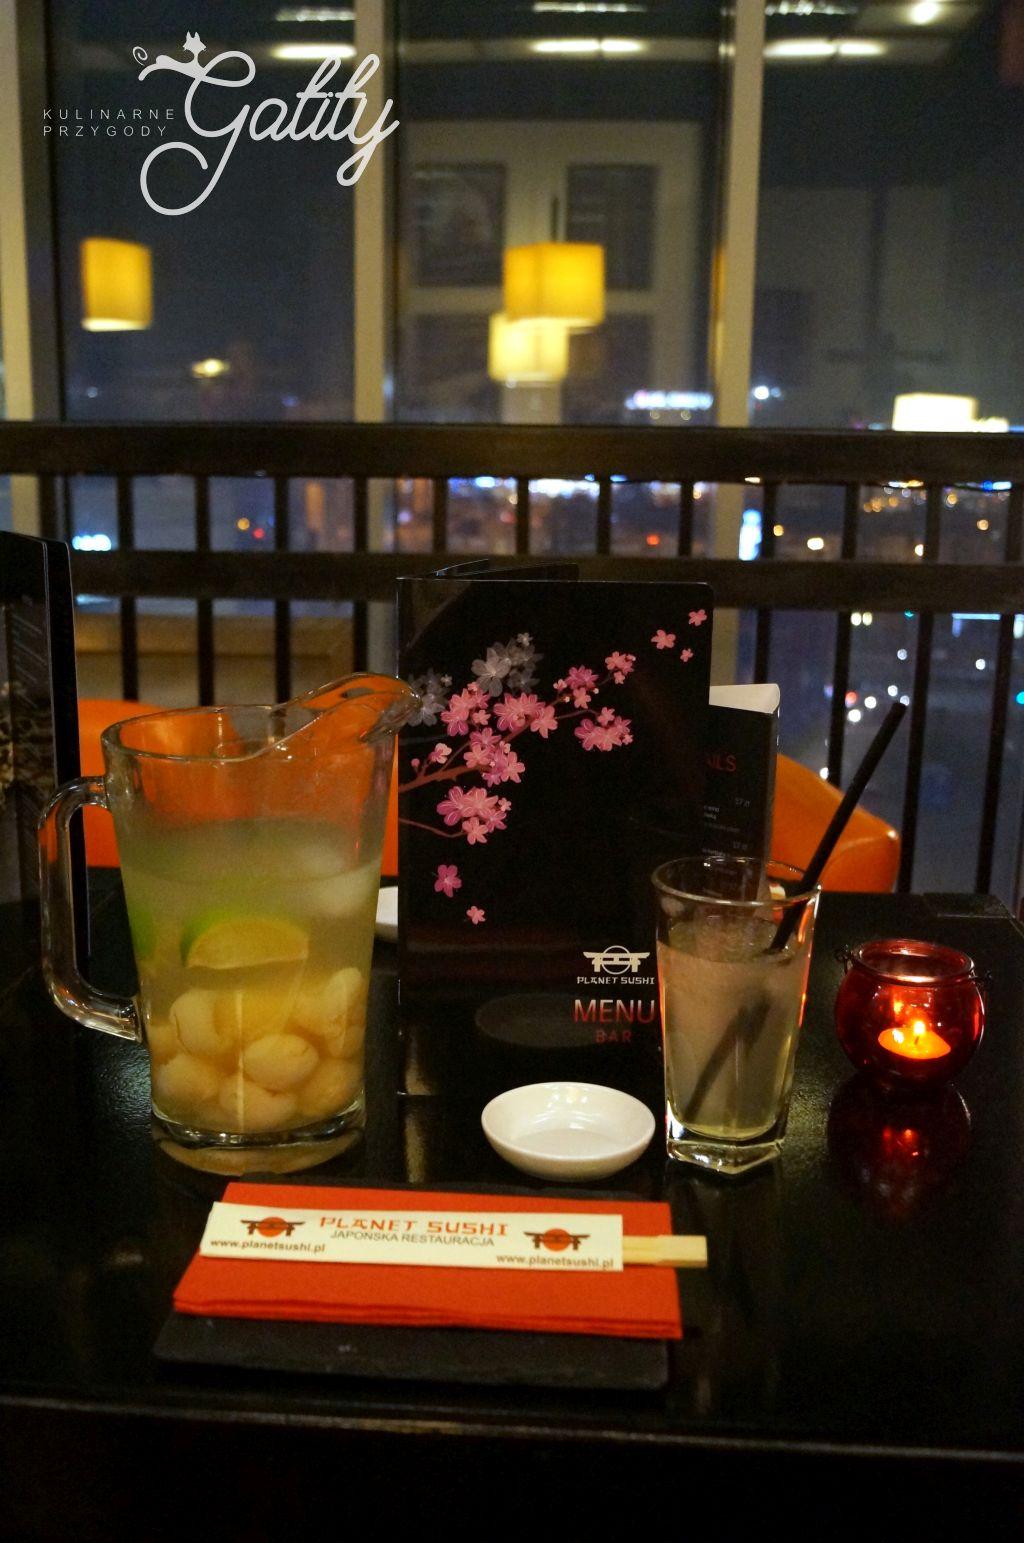 Planet Sushi i rameny w nowym menu